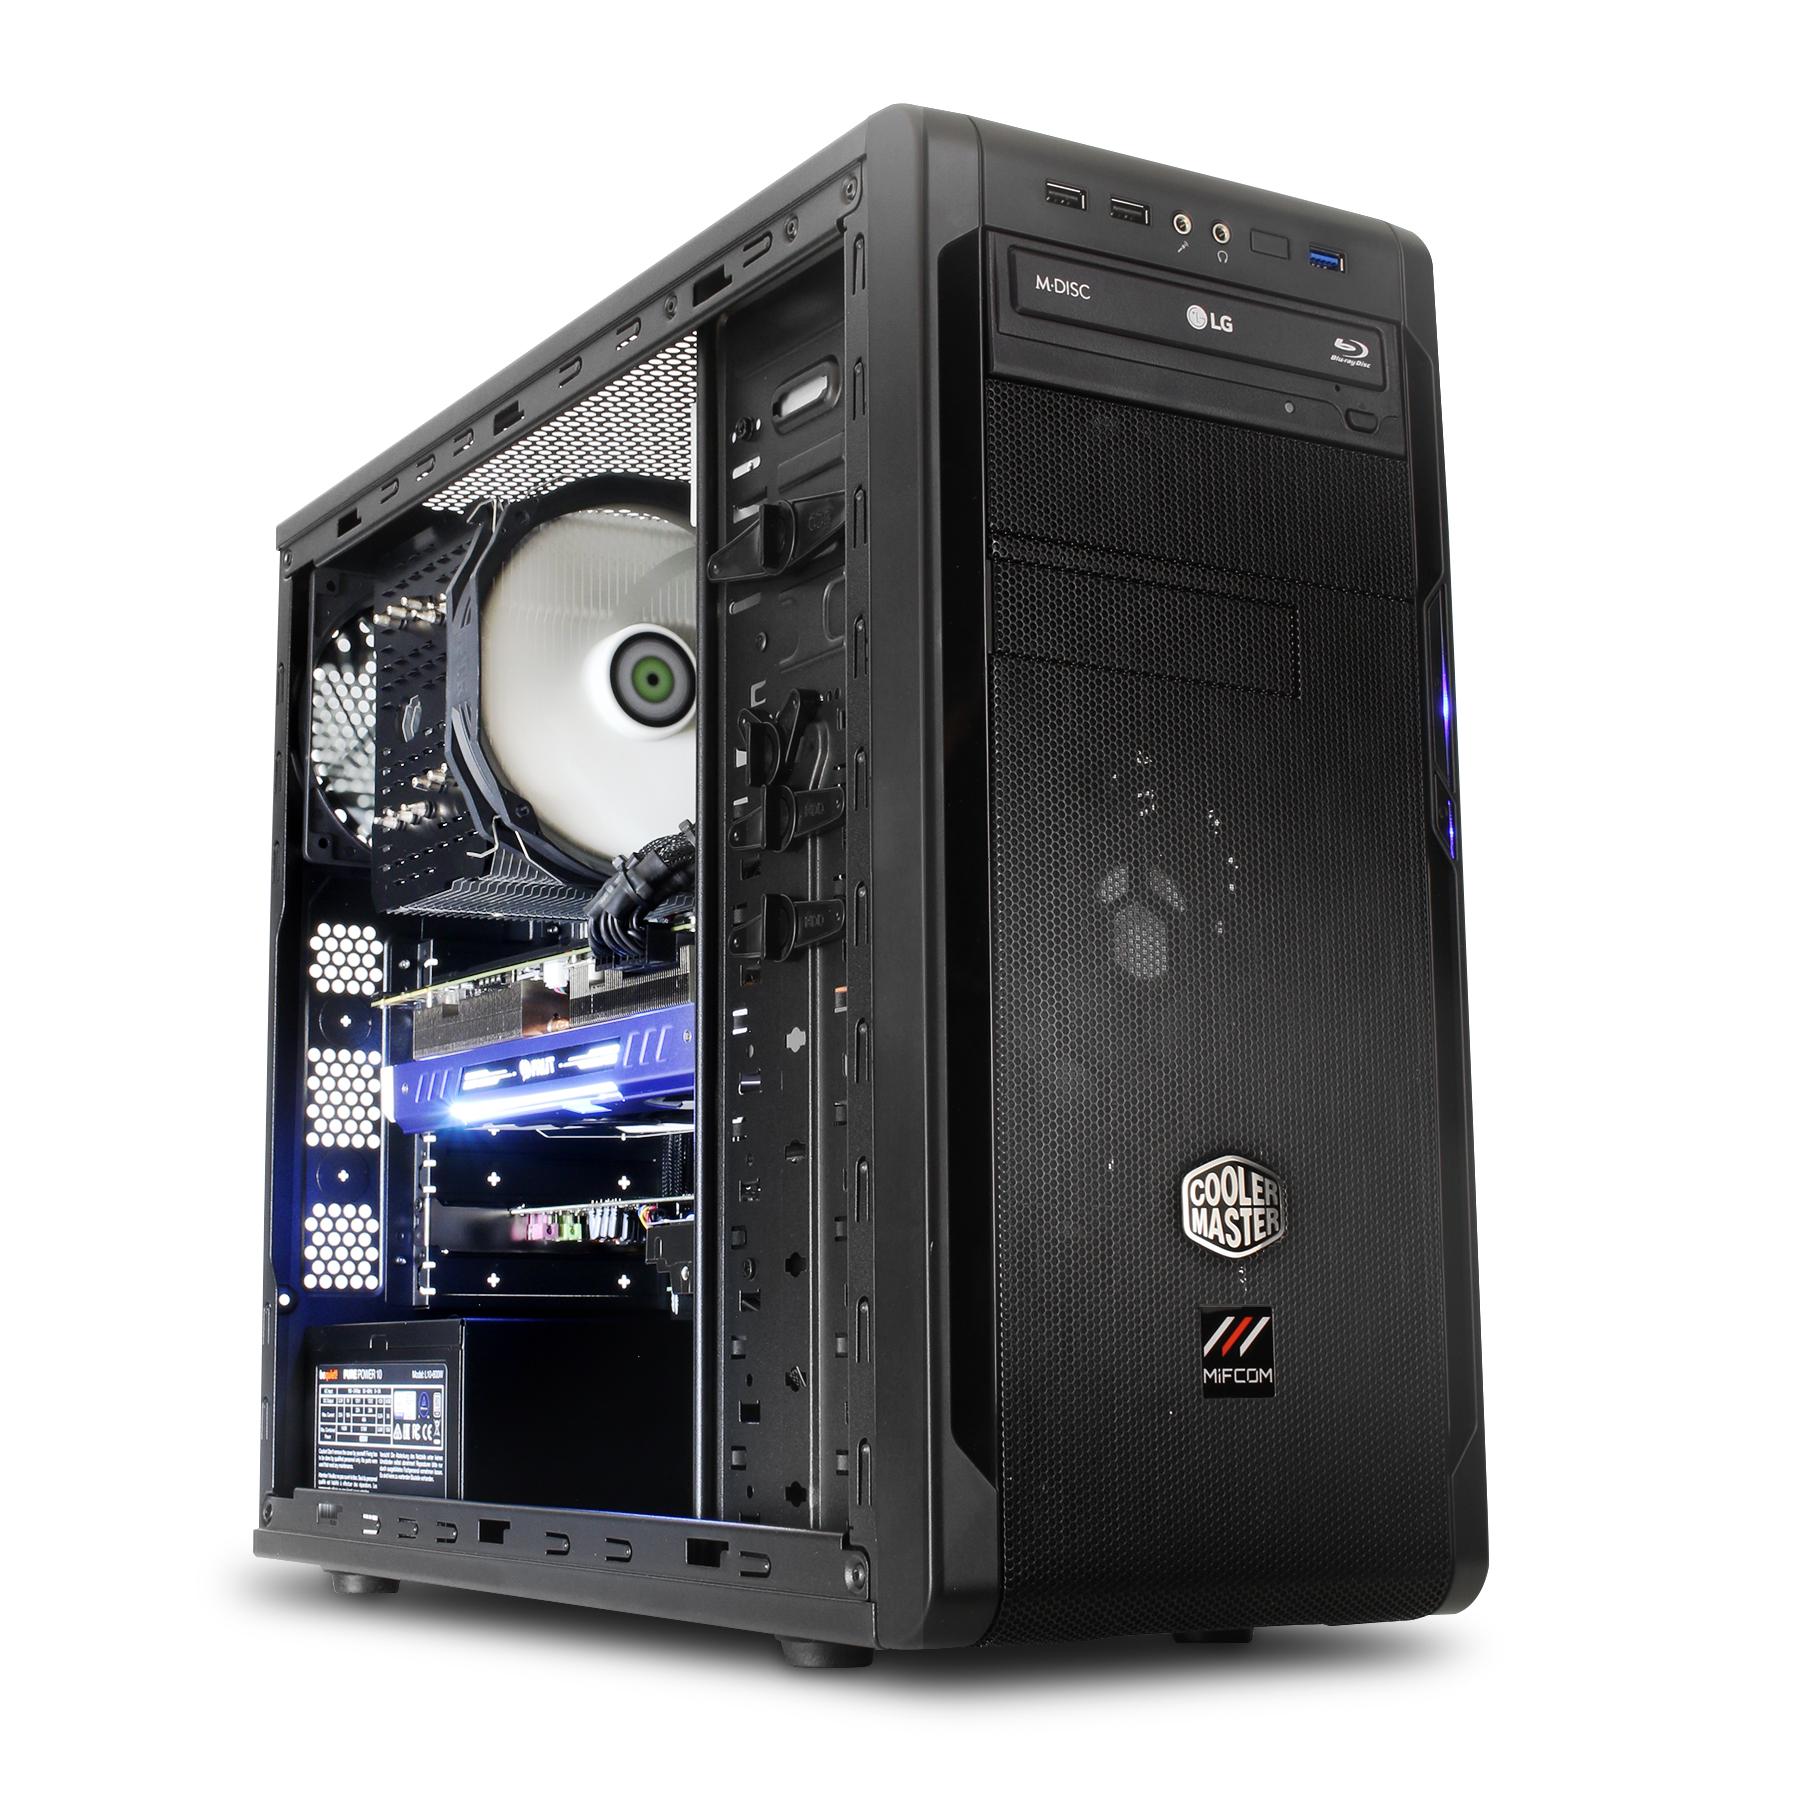 gaming pc ryzen 5 1600 gtx 1060 3gb ssd gaming pc amd. Black Bedroom Furniture Sets. Home Design Ideas